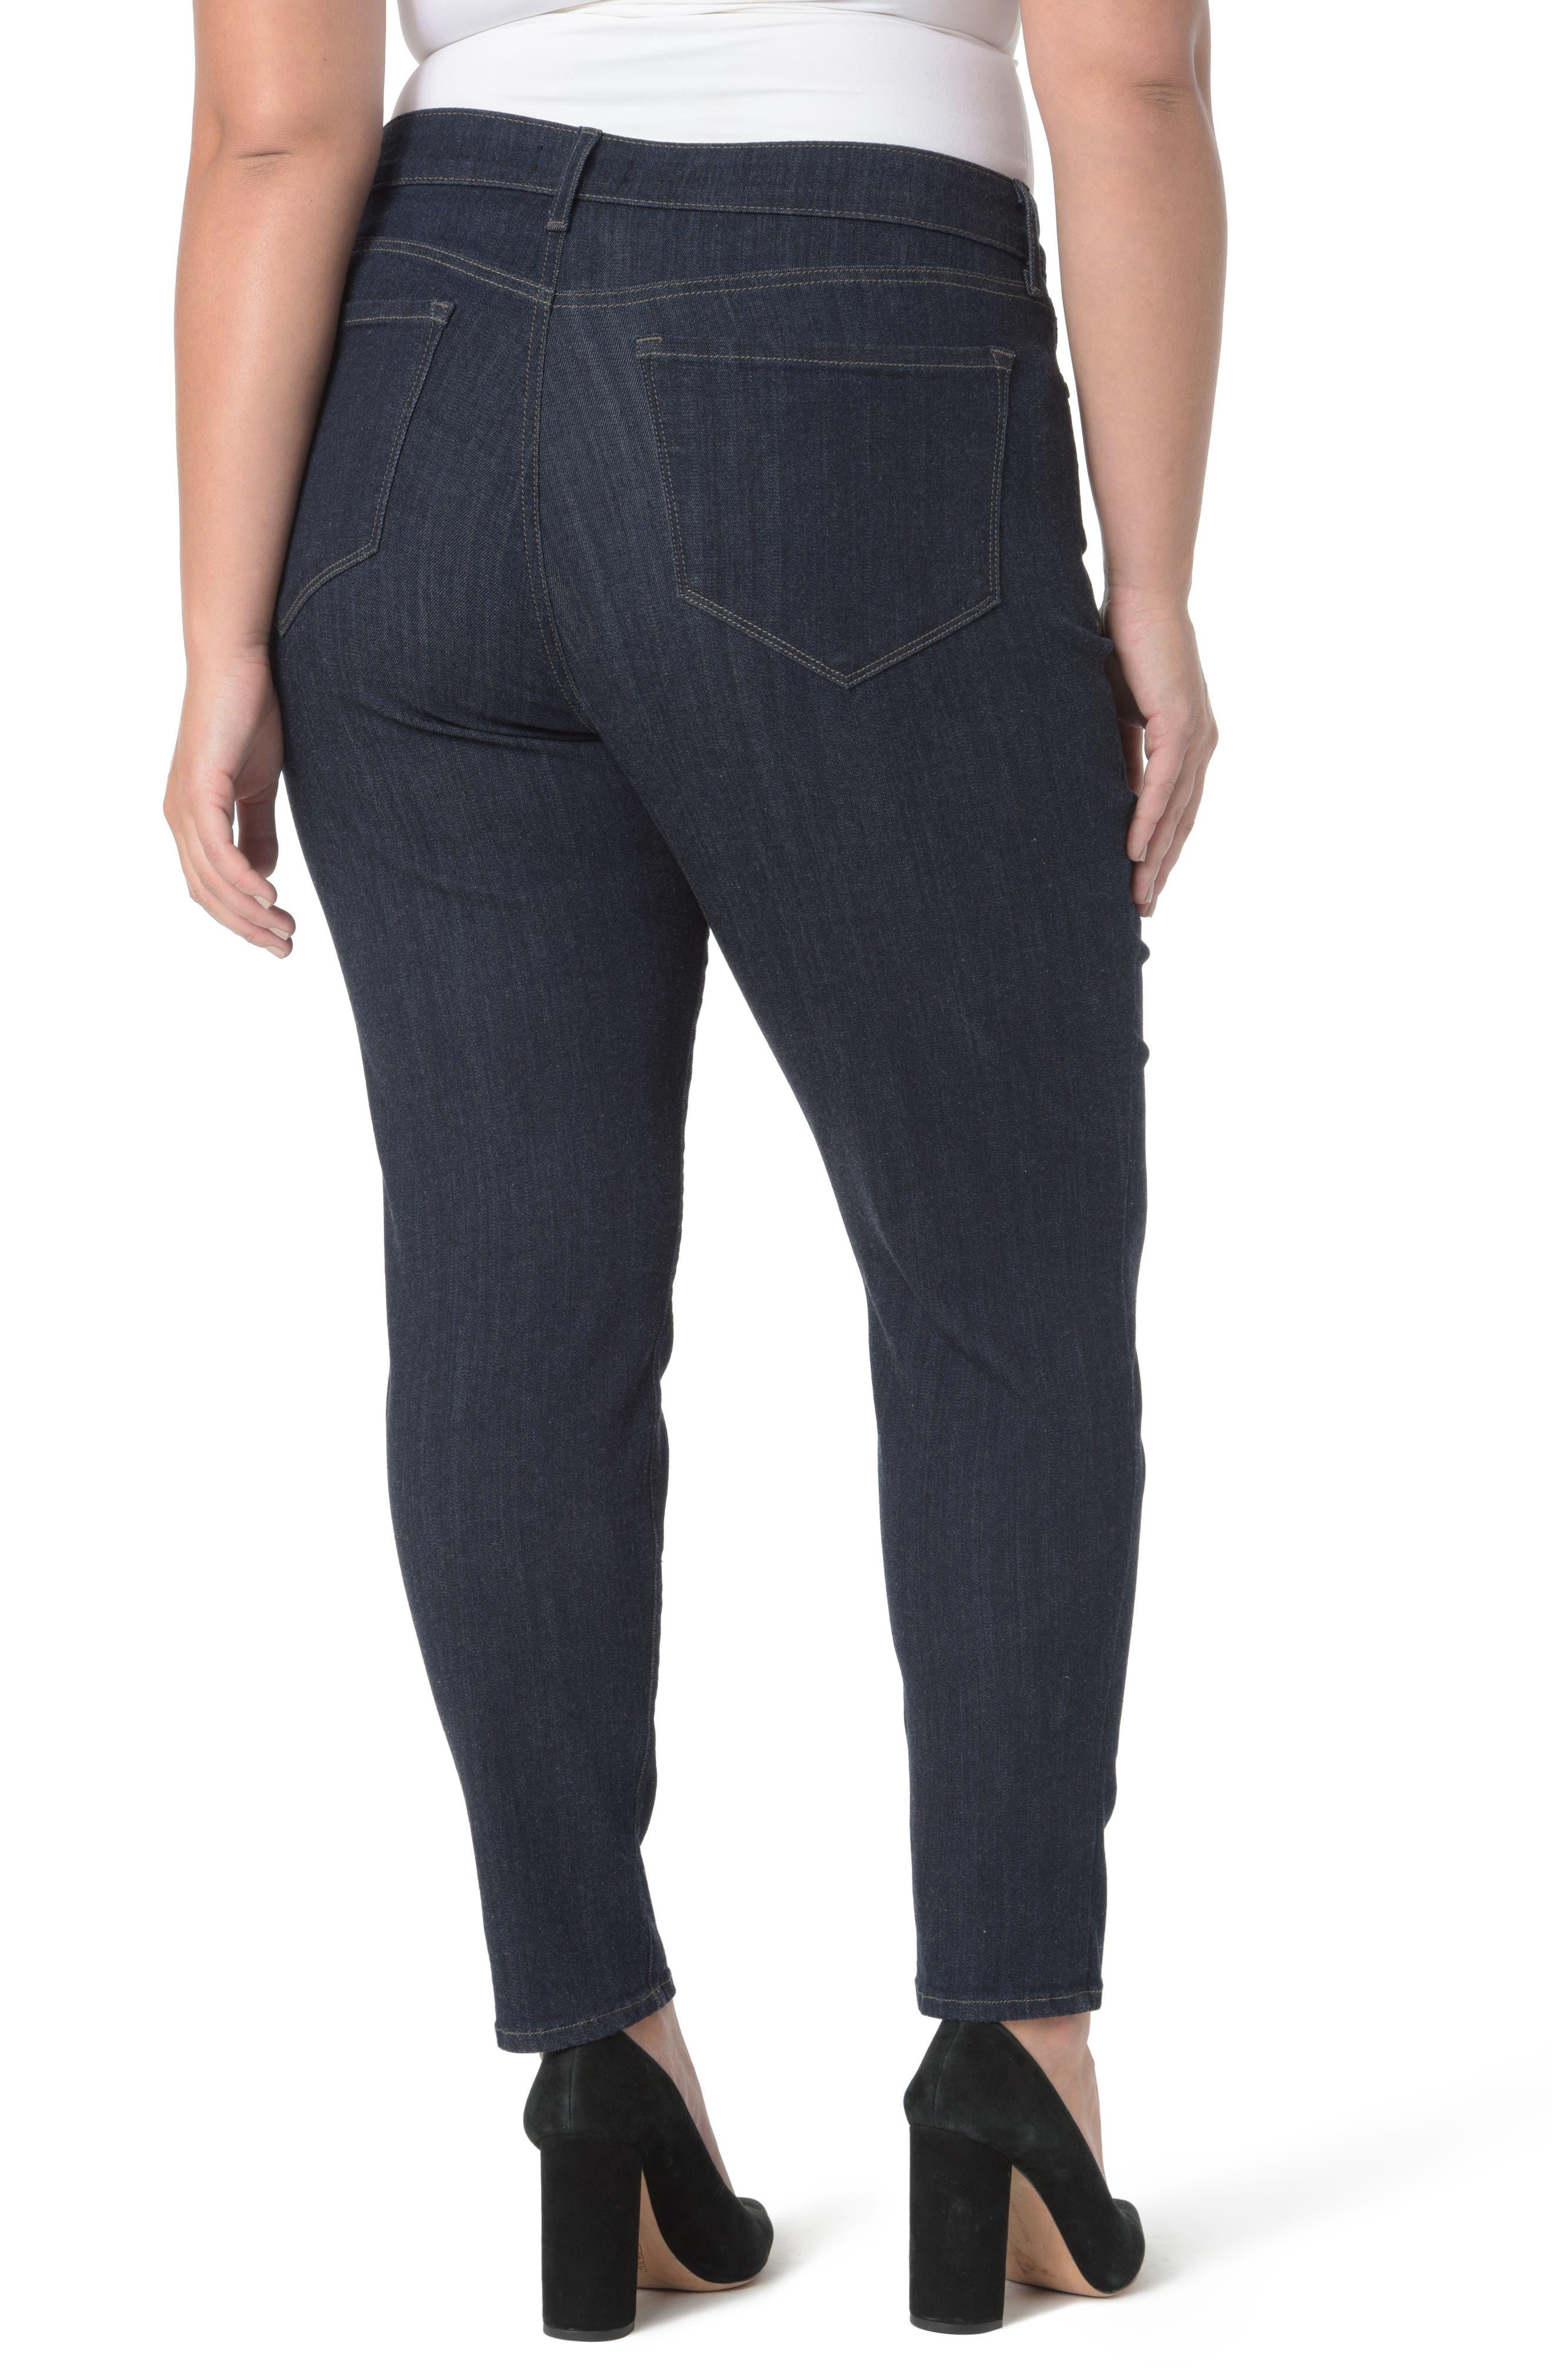 Ami Skinny Legging Jeans,                             Alternate thumbnail 2, color,                             Mabel